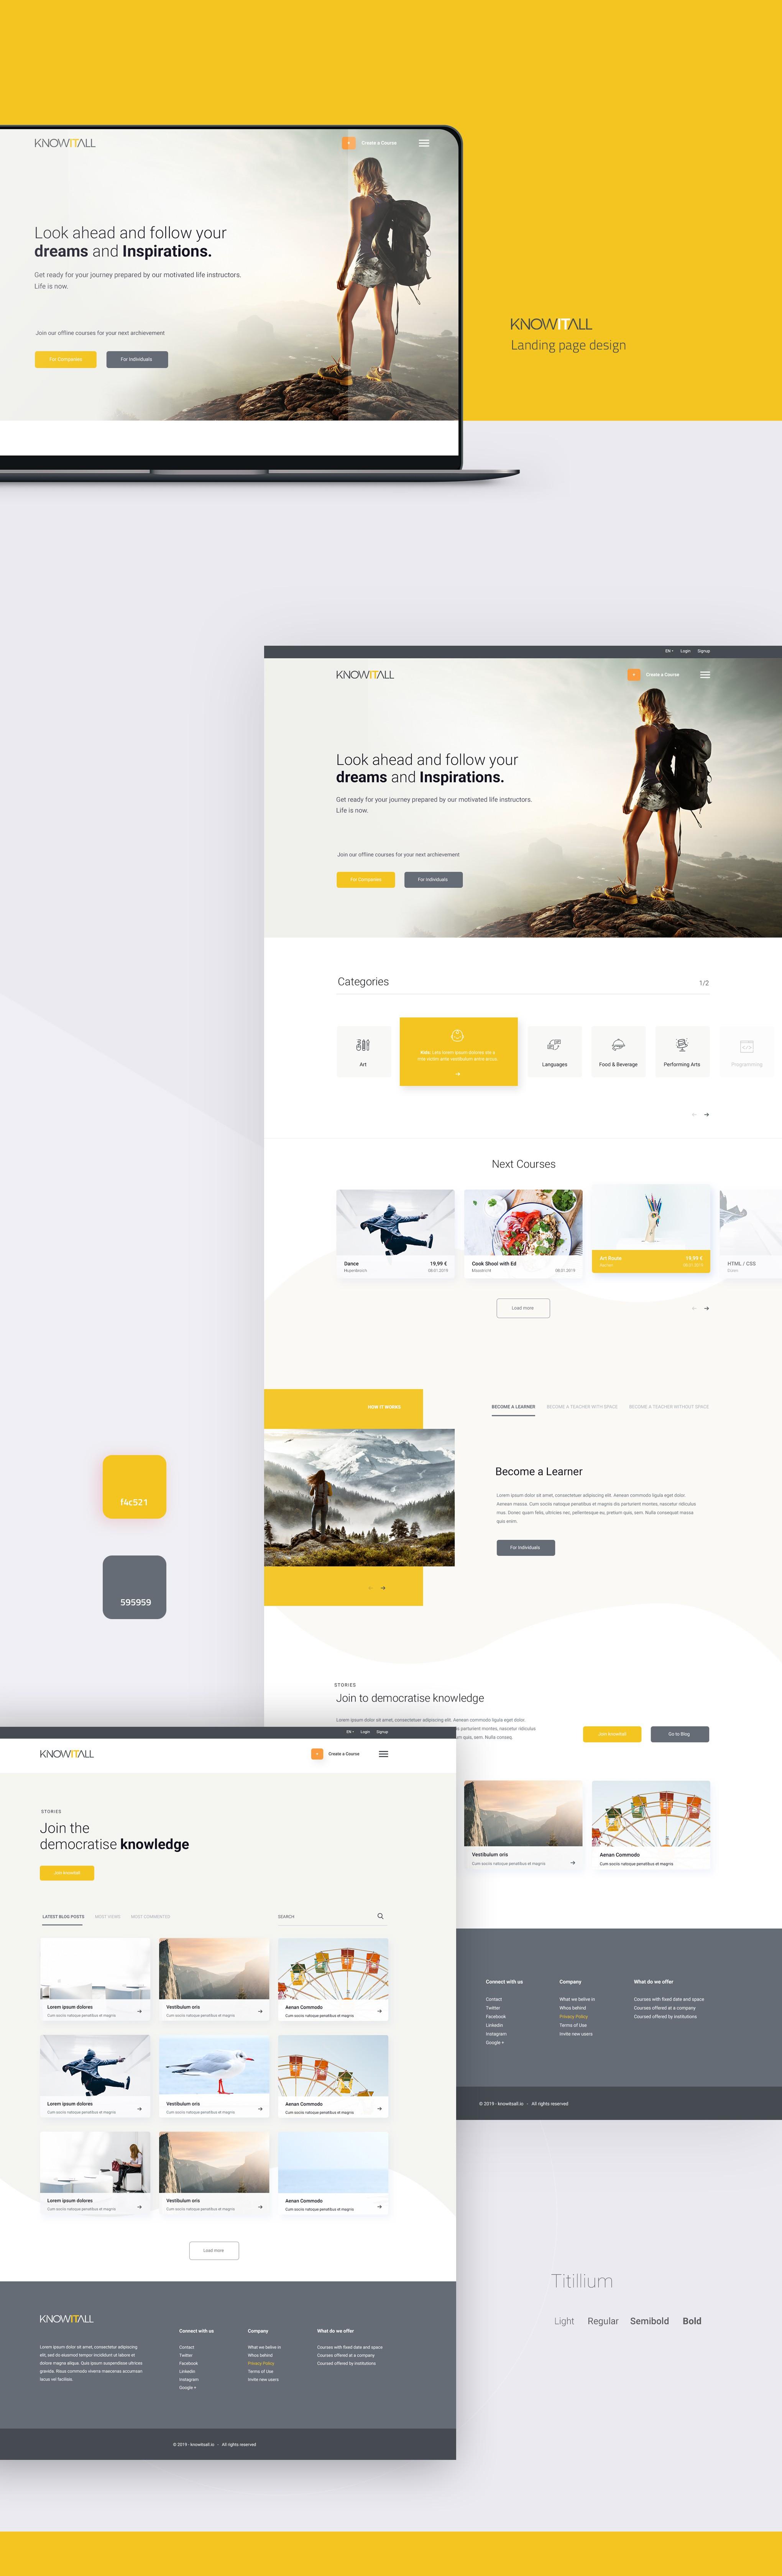 Inspirational webdesign needed for funded startup.